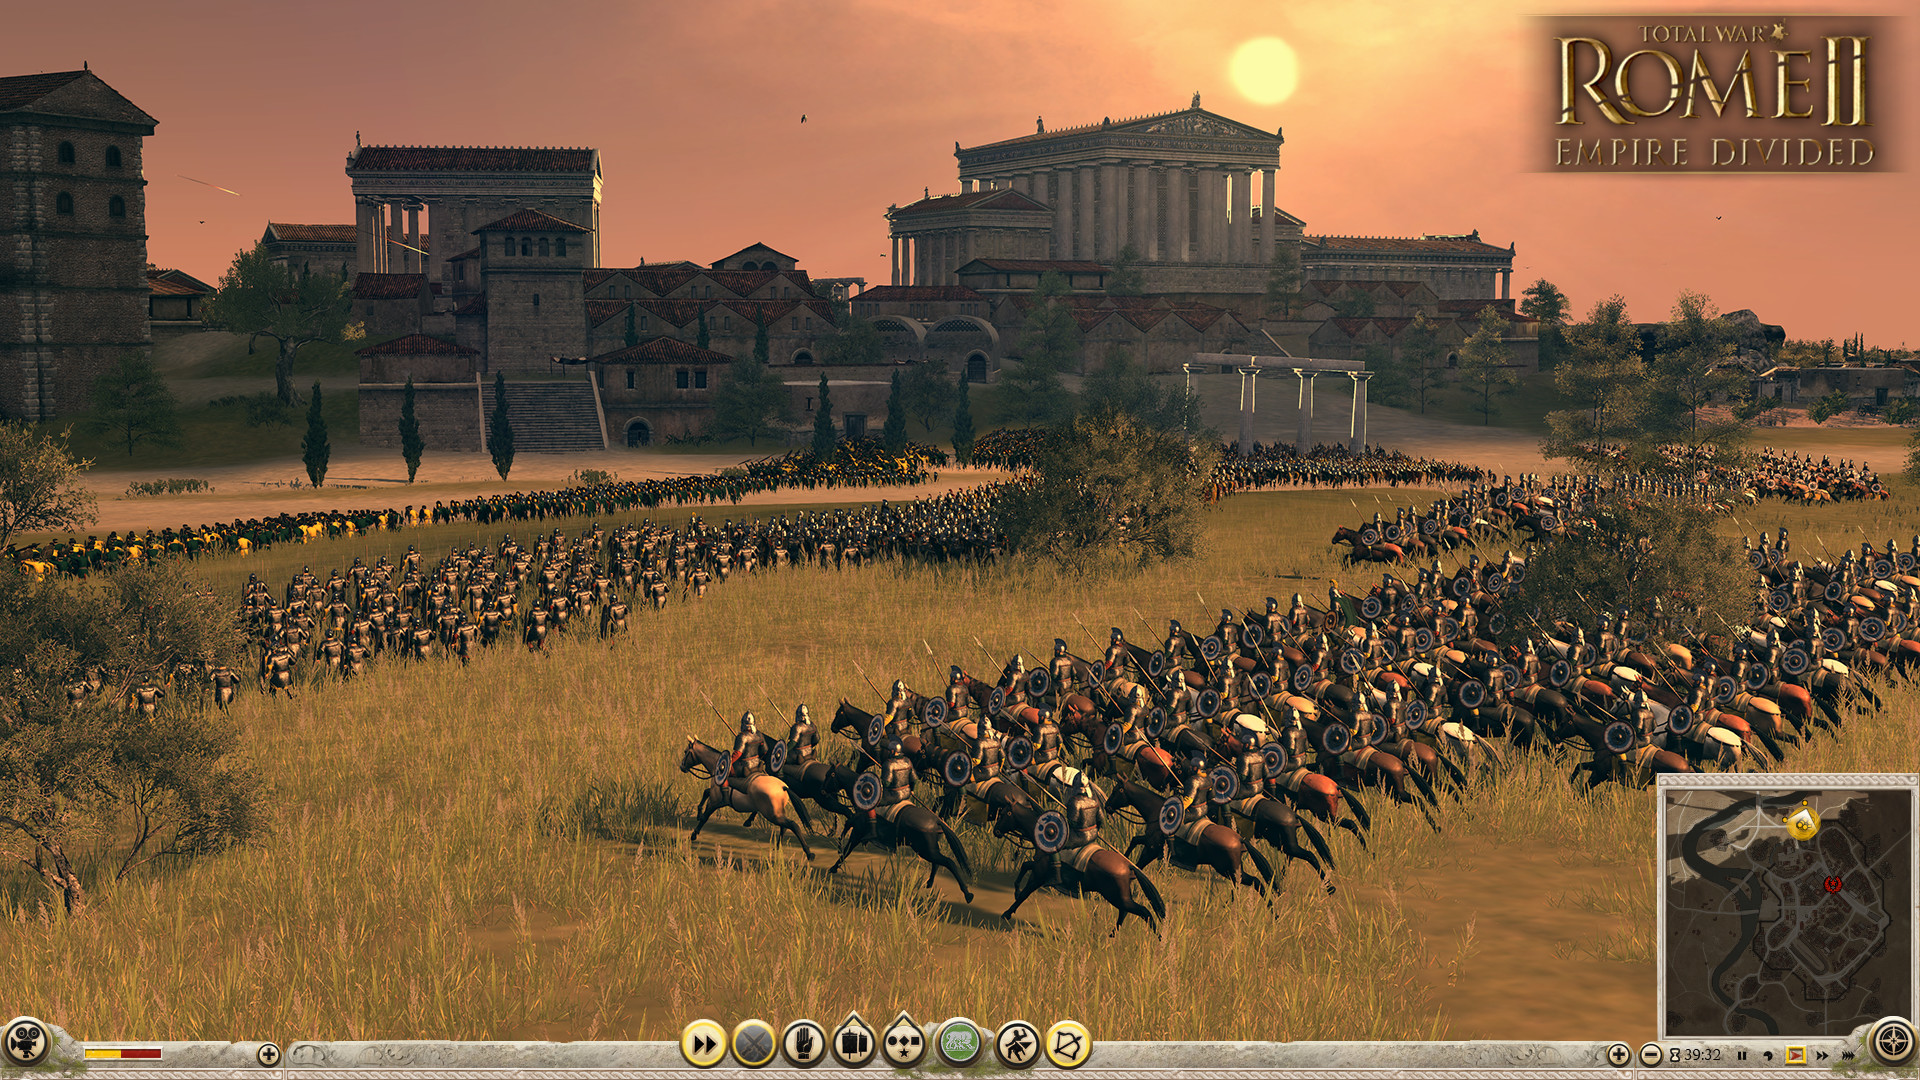 brigands rome total war download - photo#43